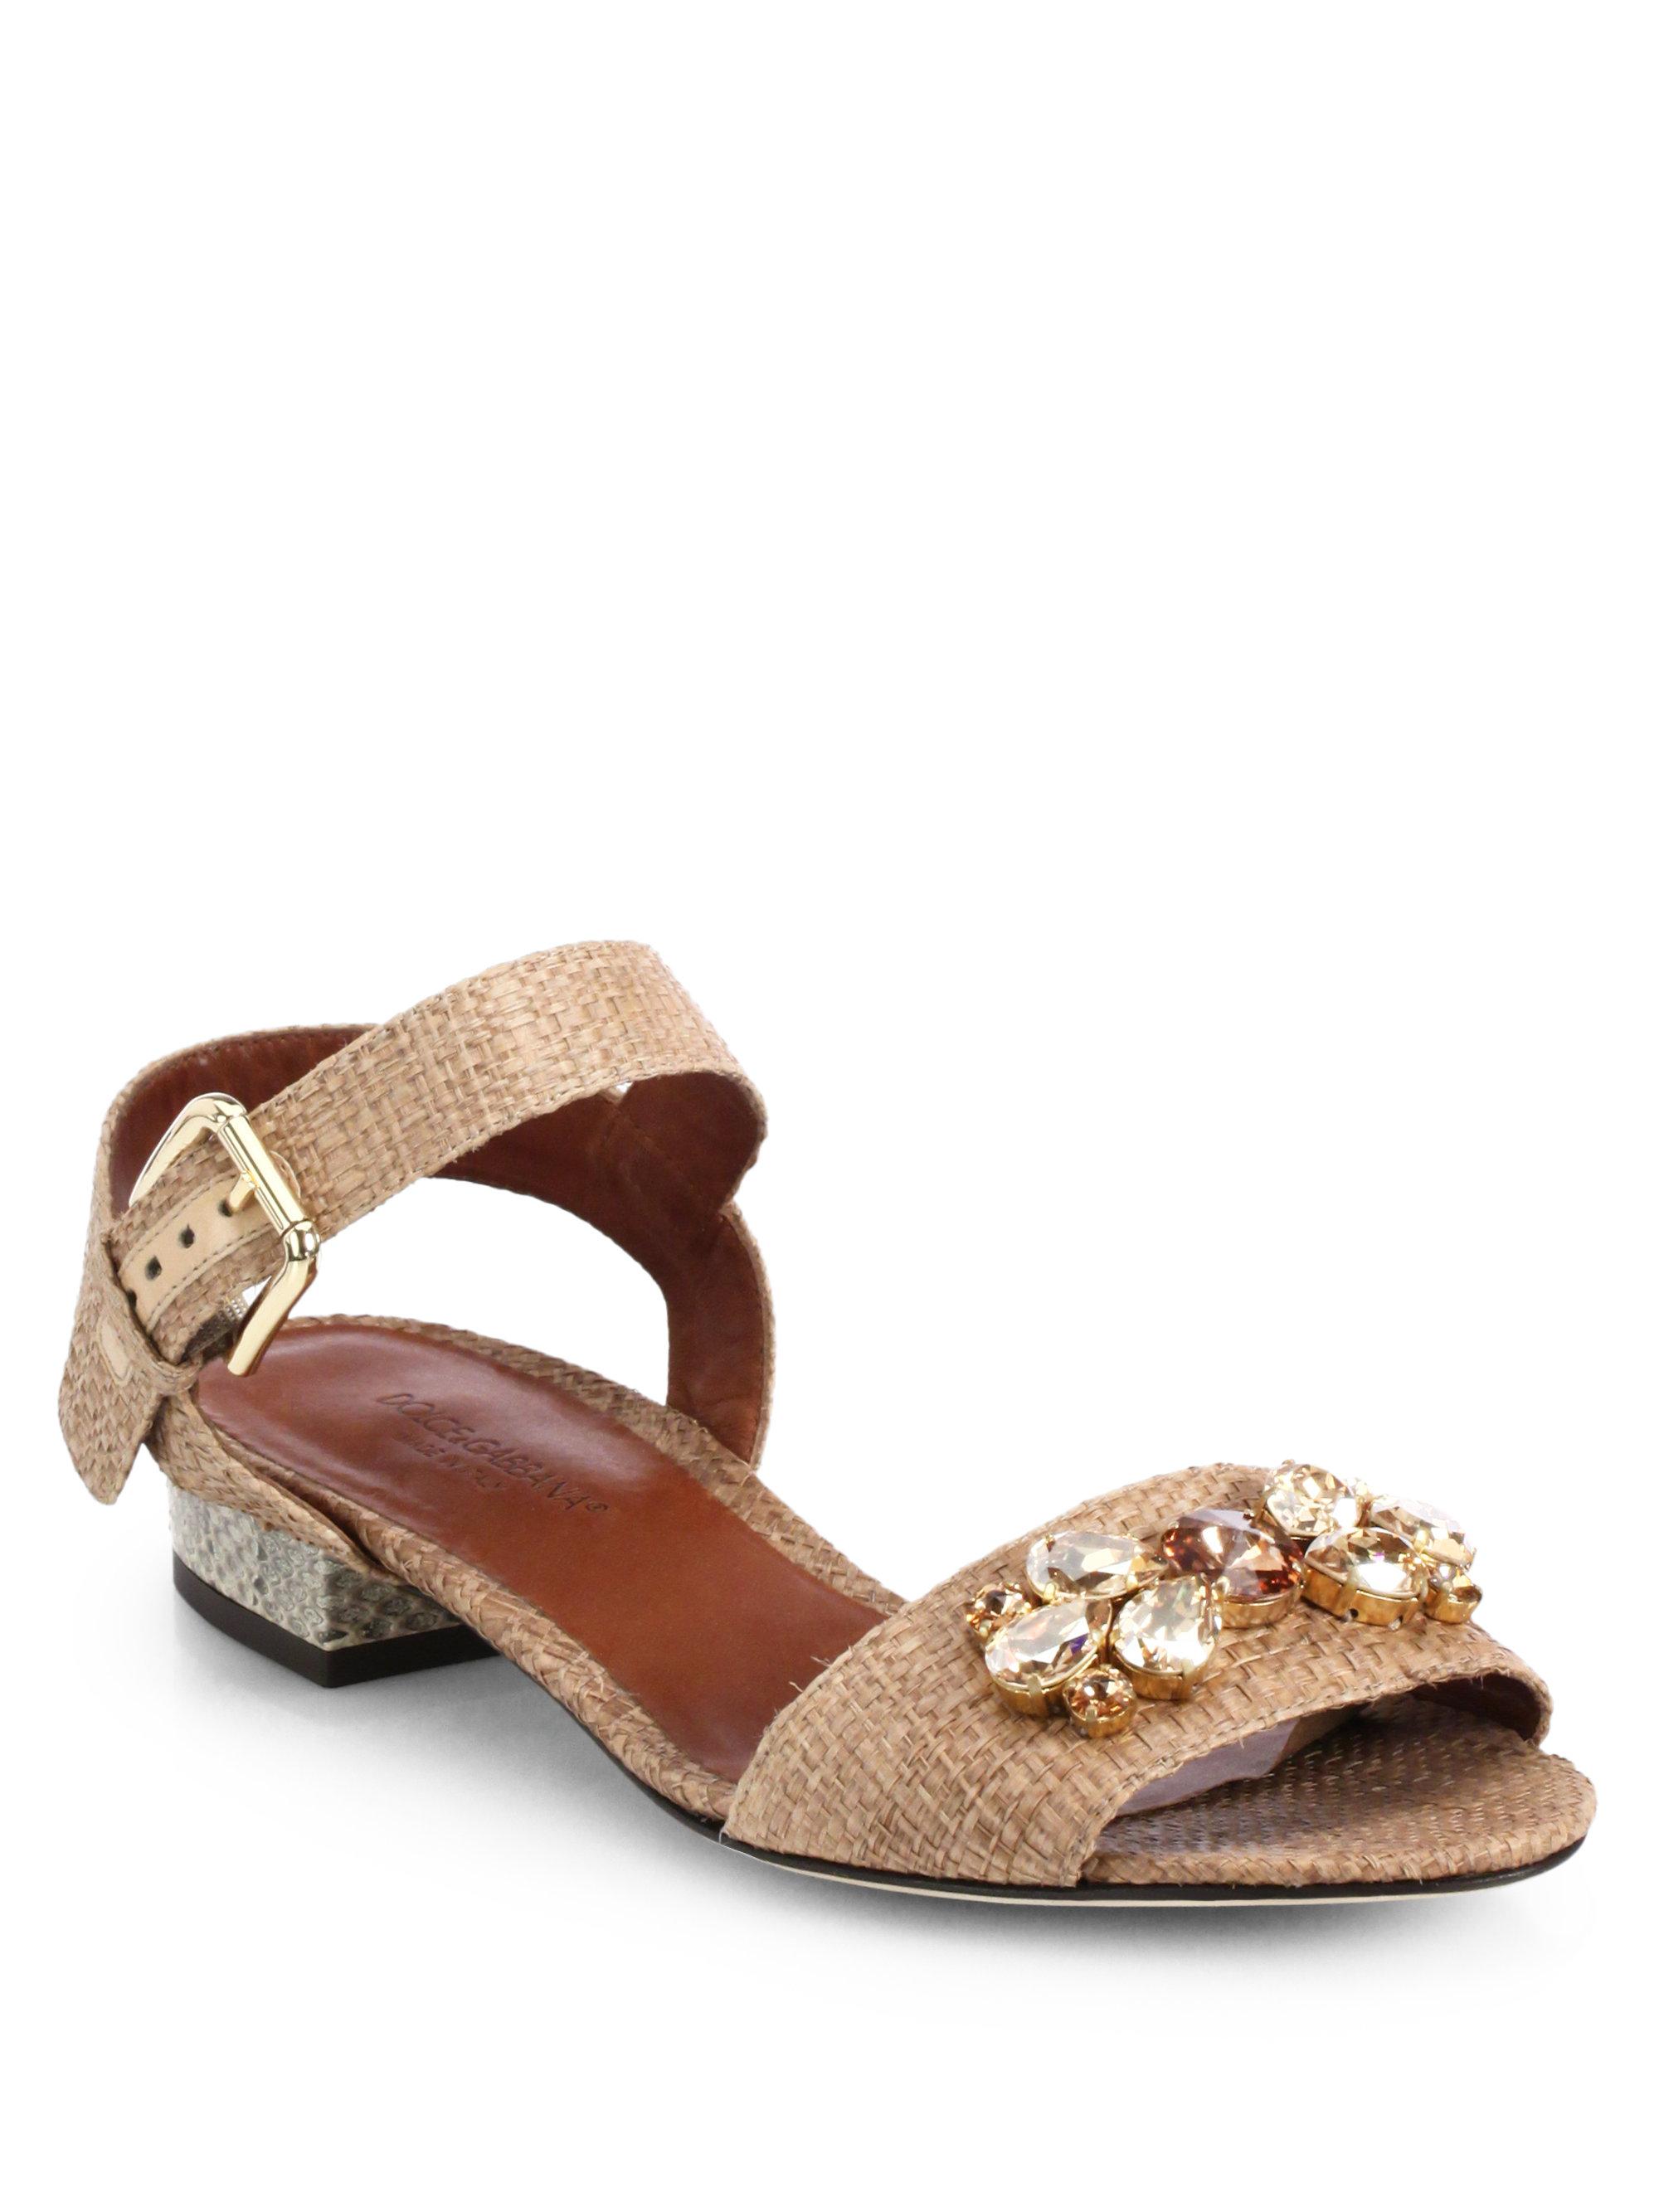 801b5c81847d Lyst - Dolce   Gabbana Jeweled Raffia Snakeskin Sandals in Brown